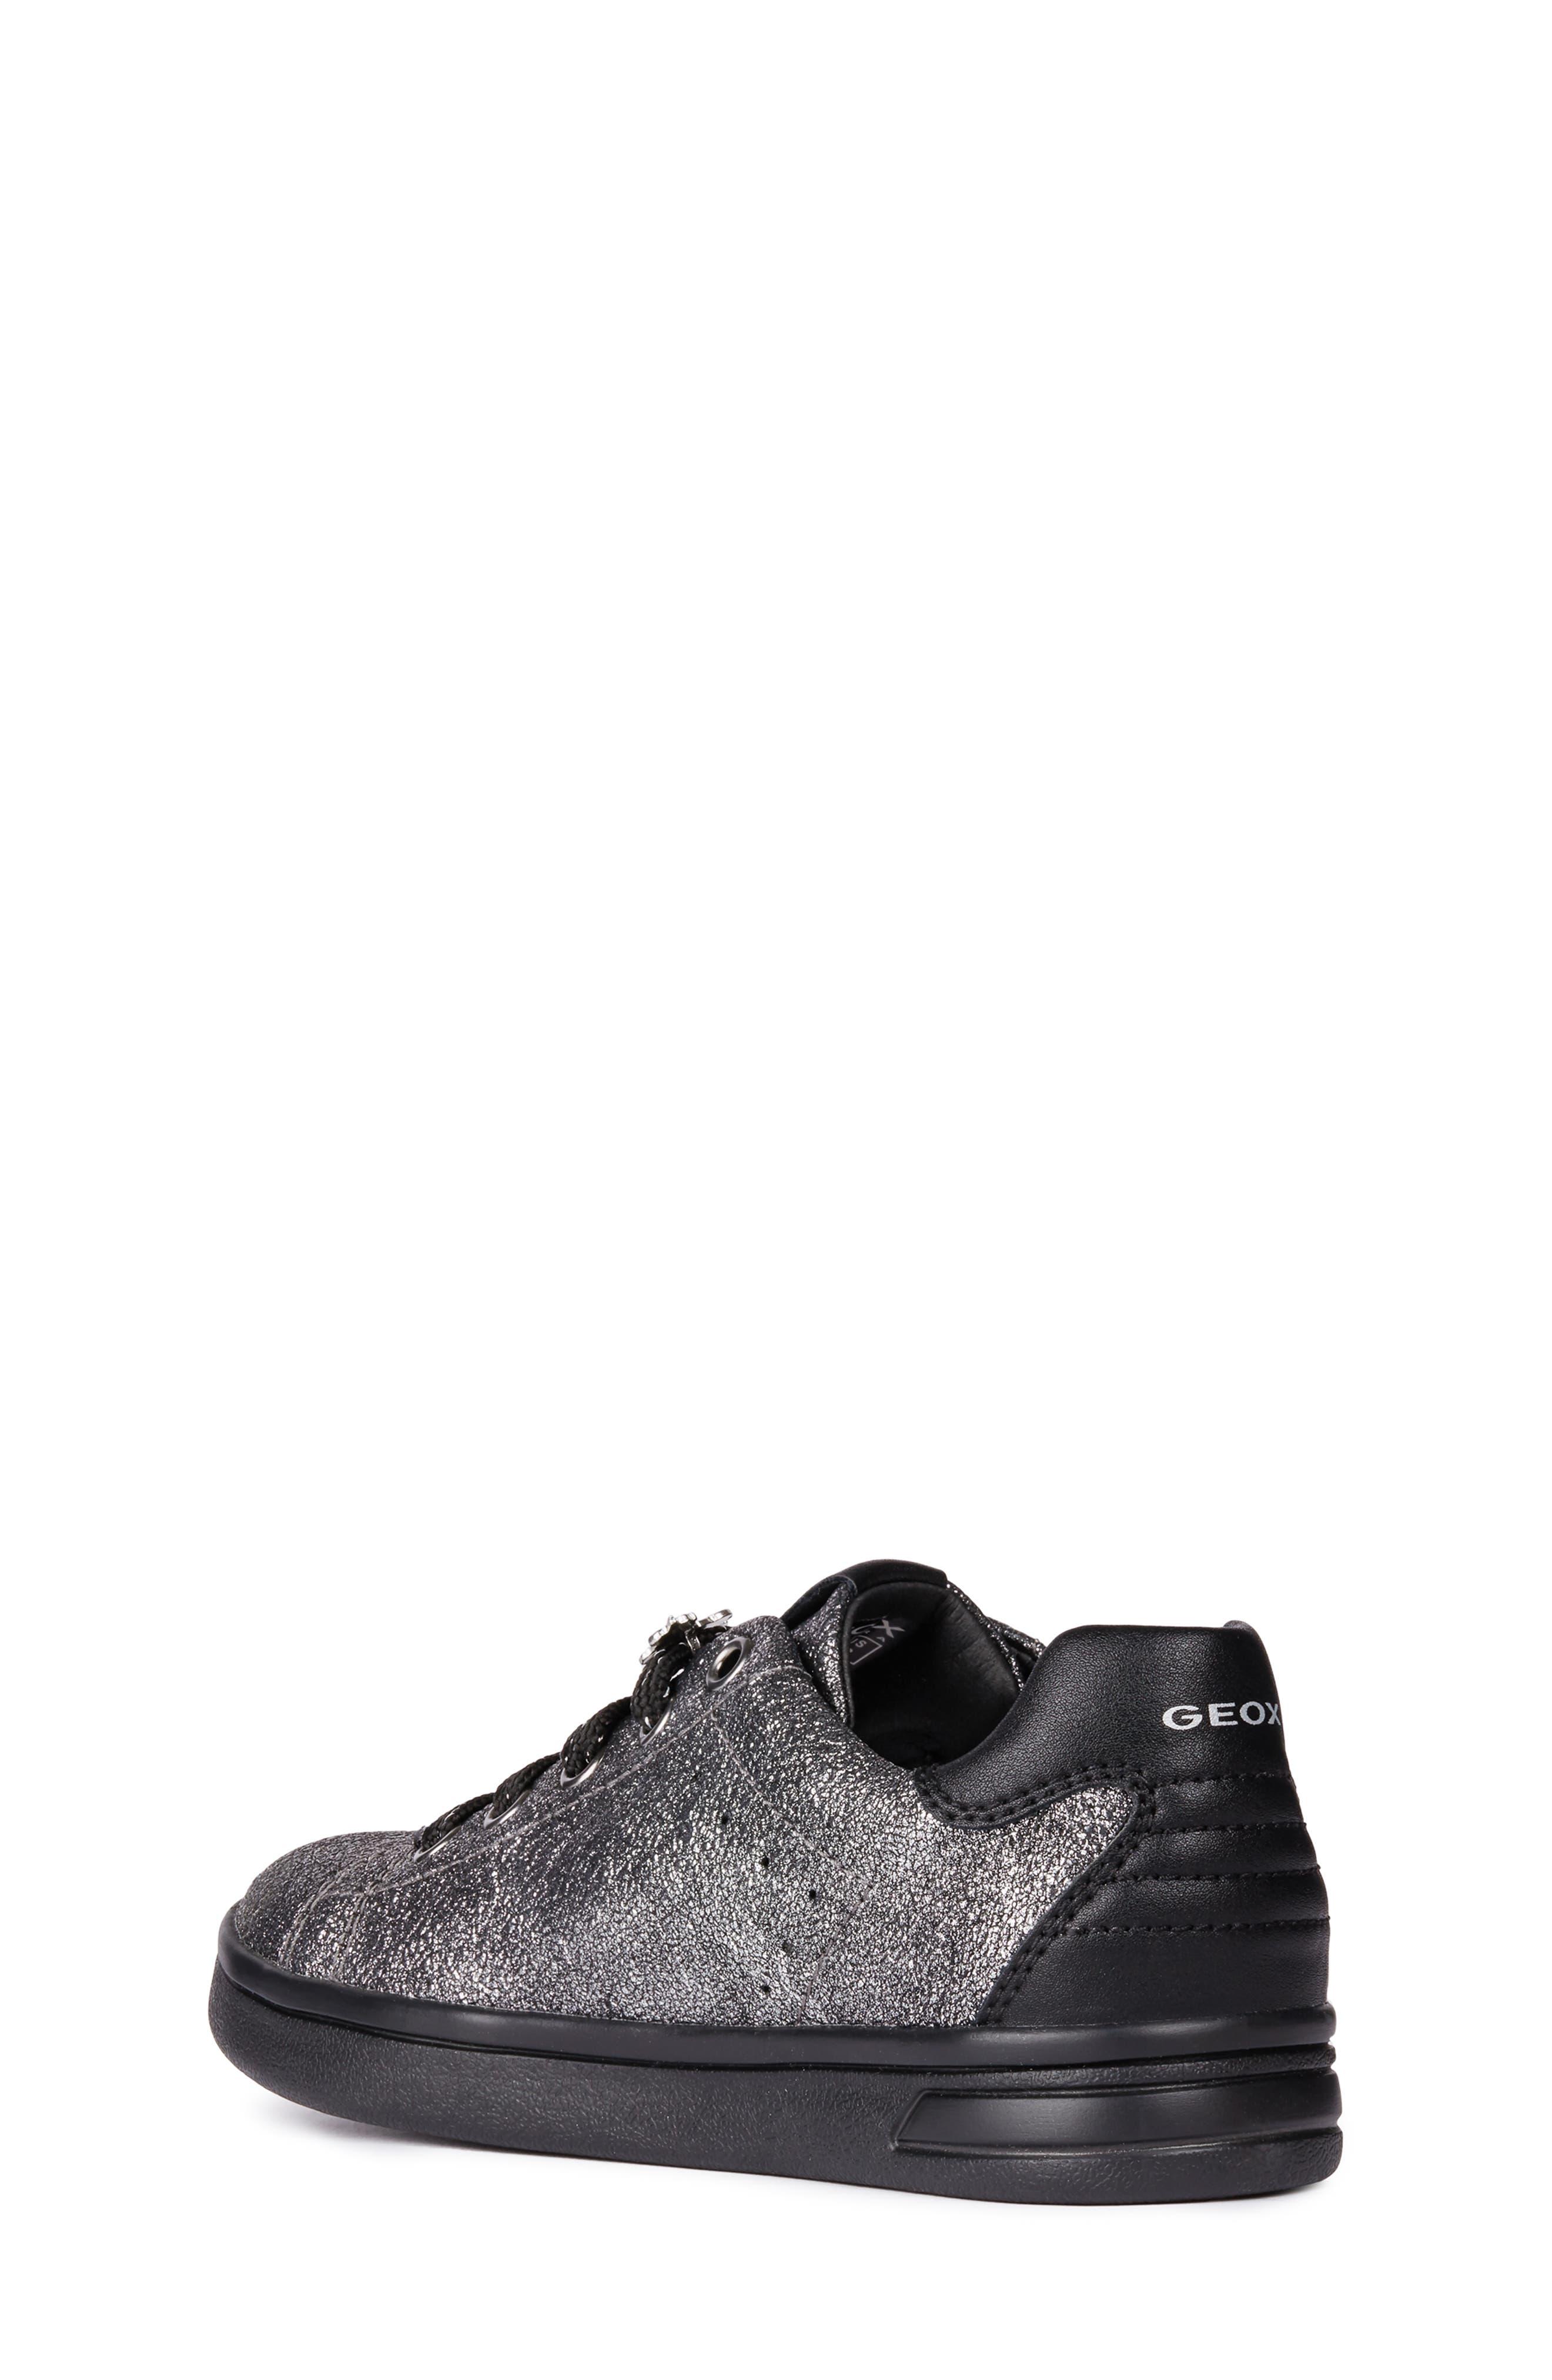 DJ Rock Metallic Sneaker,                             Alternate thumbnail 2, color,                             DARK SILVER